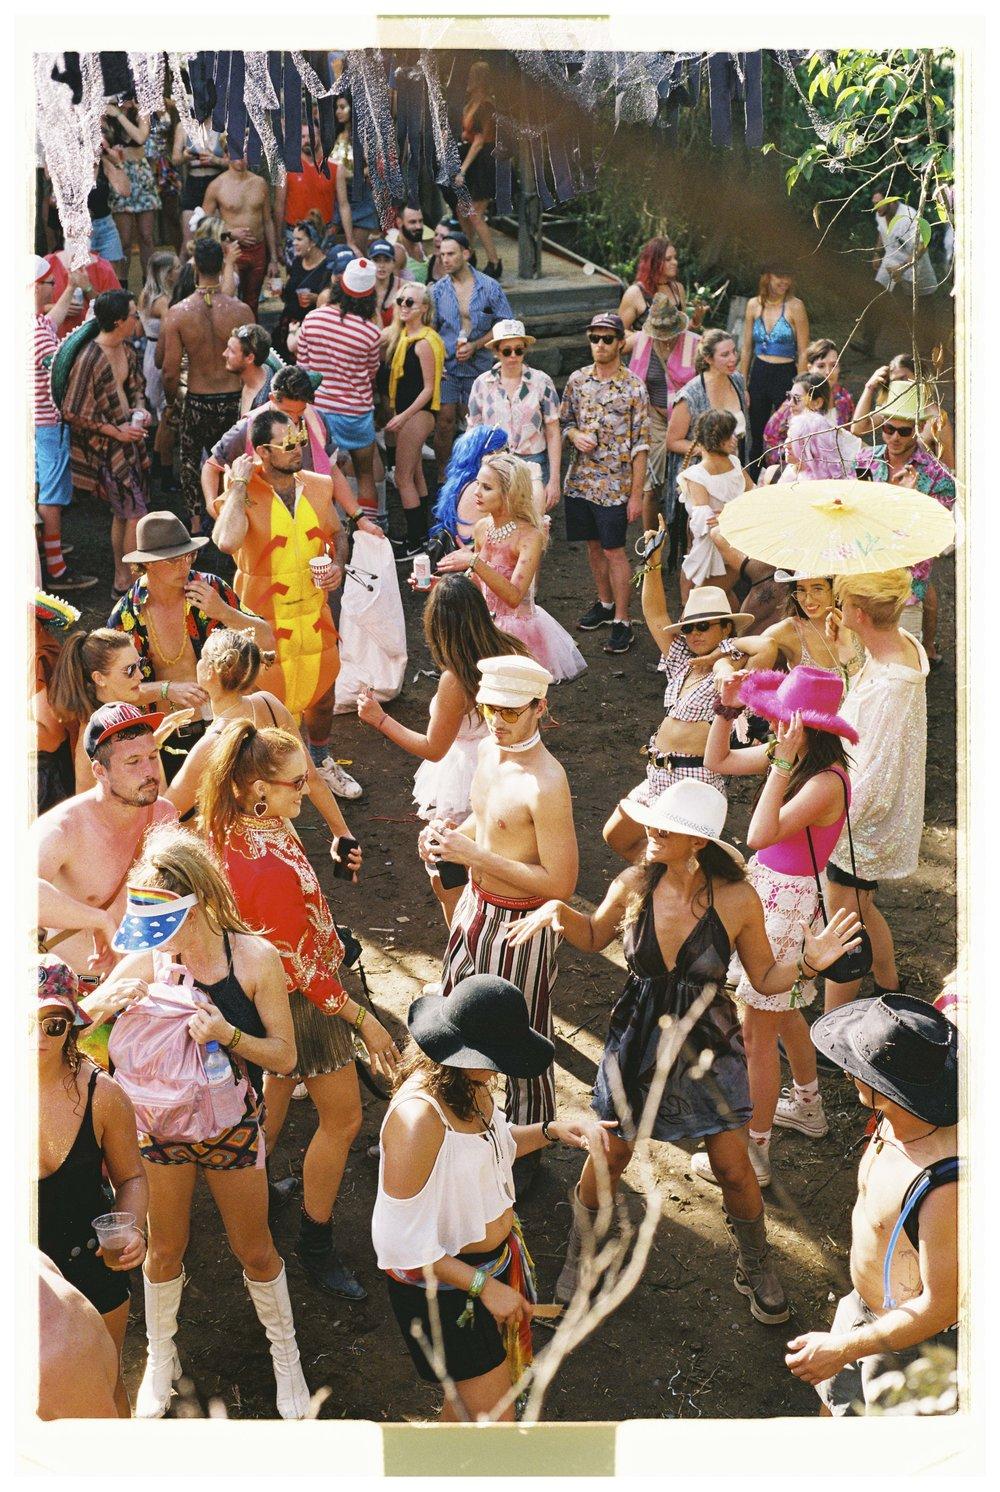 Crowd & Festival - Nikon F3 - Fuji Industrial 100 - 19.jpg